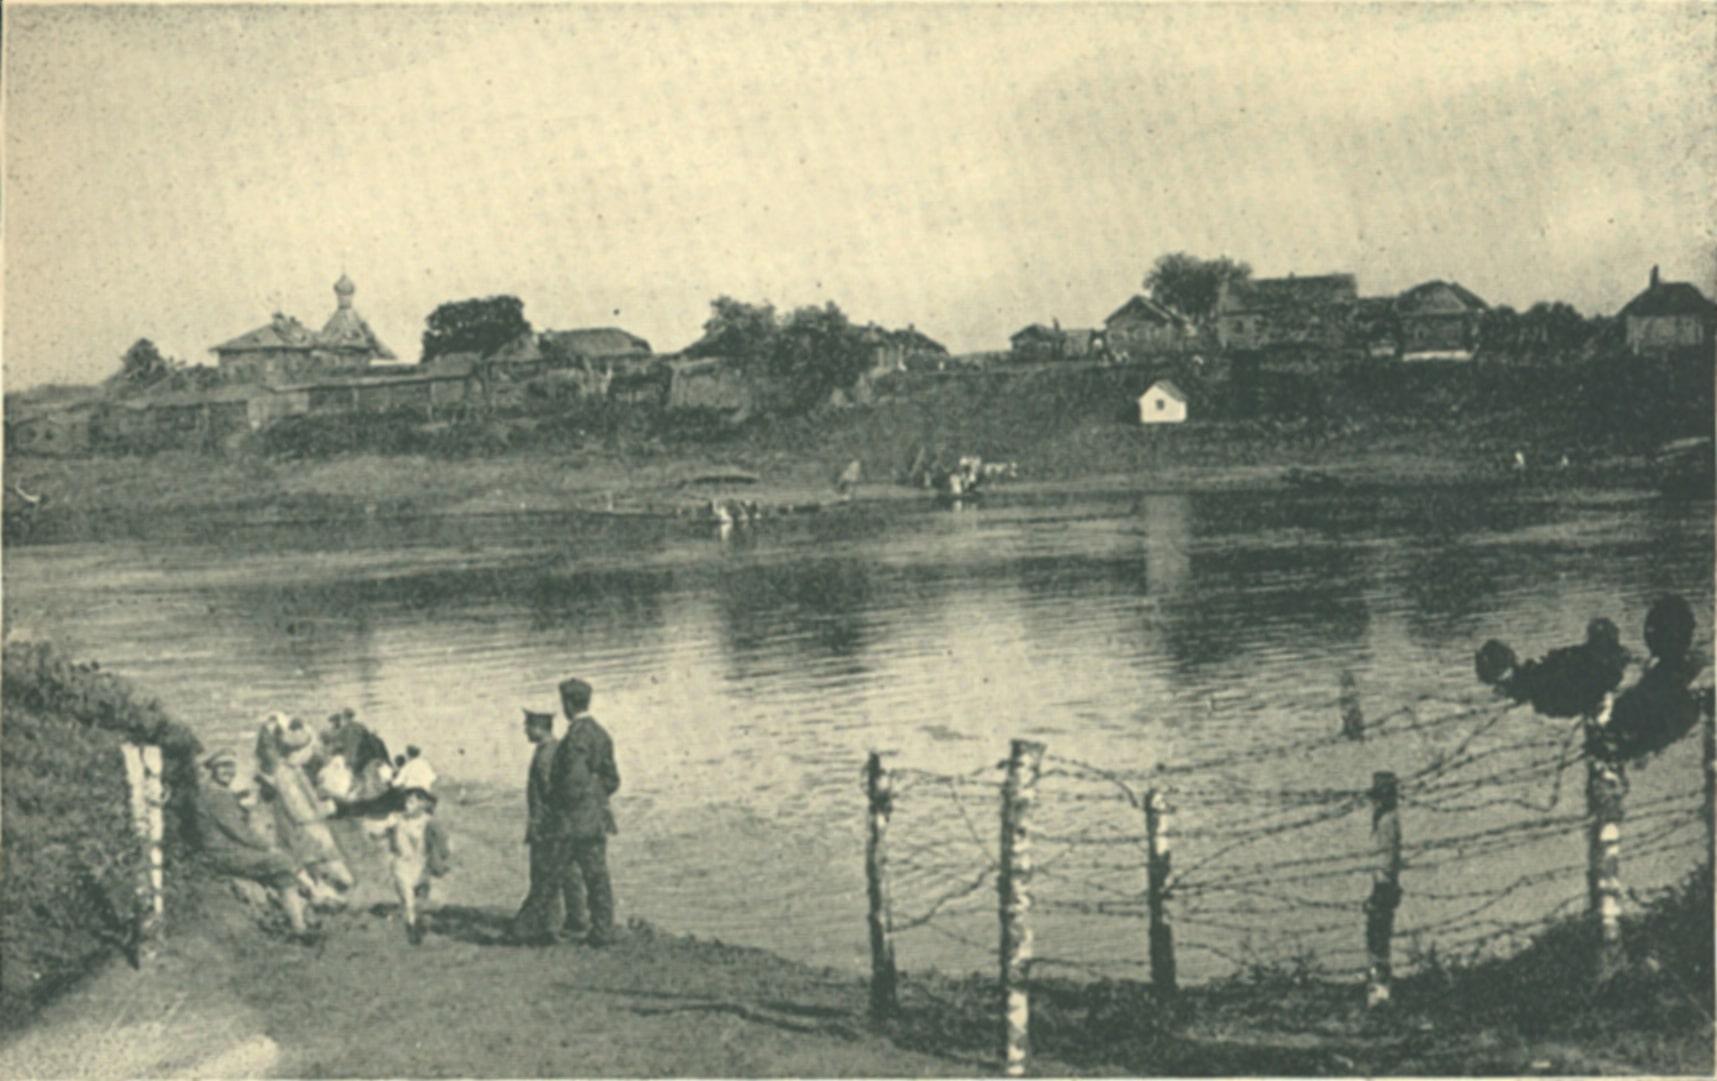 К началу 20 века Копысь утратил черты города